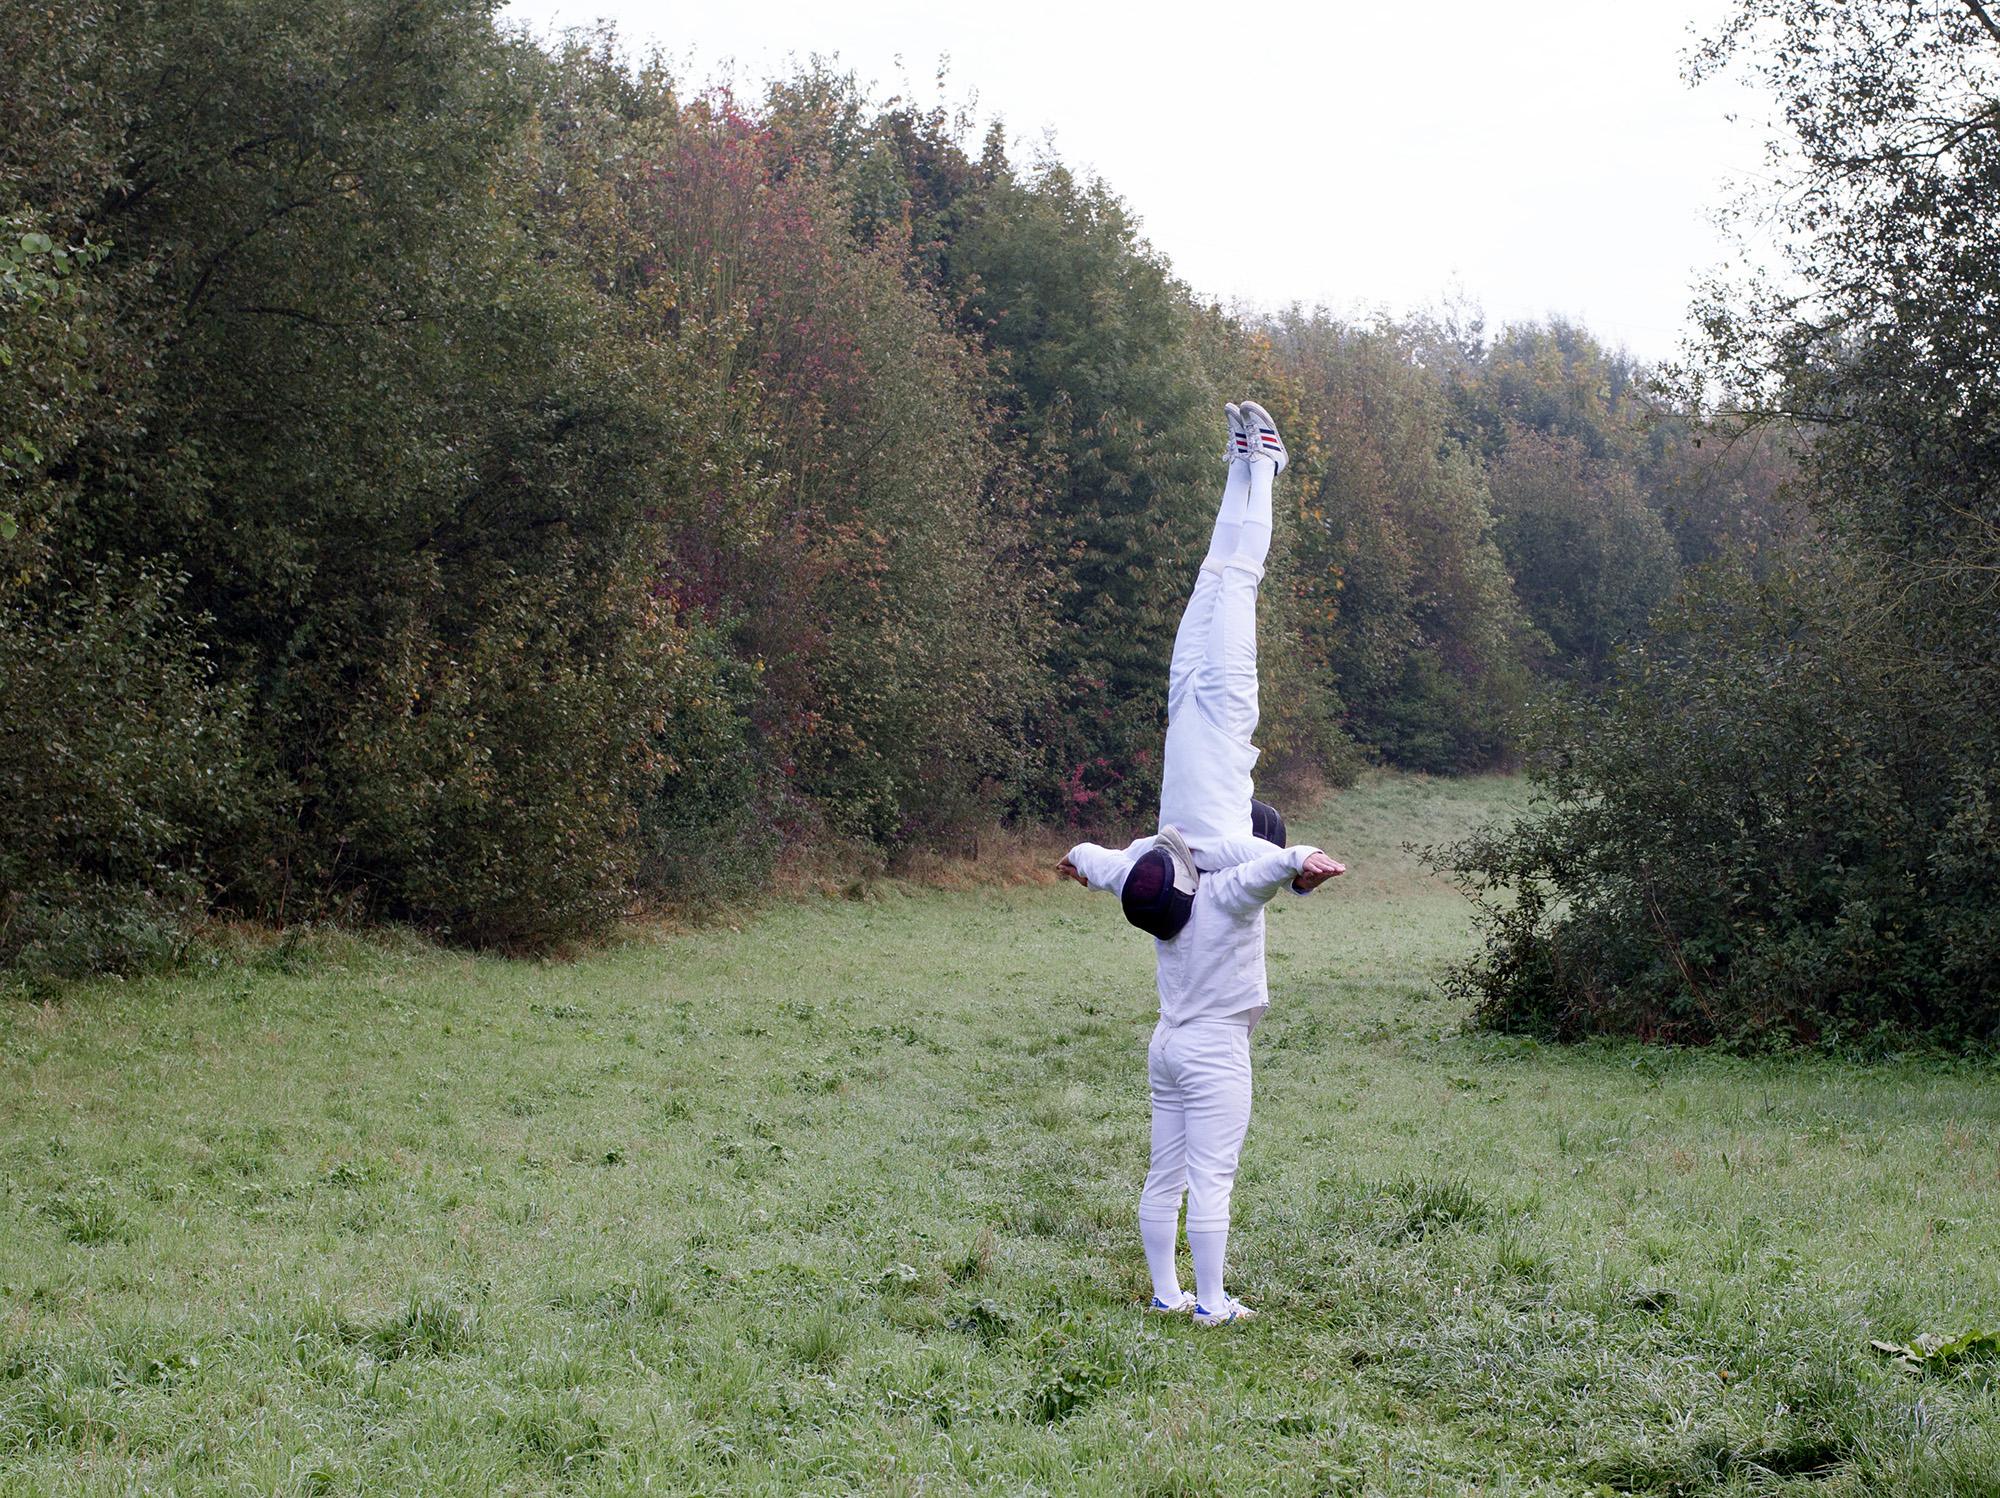 wren-artists-jean-baptiste-courtier-3